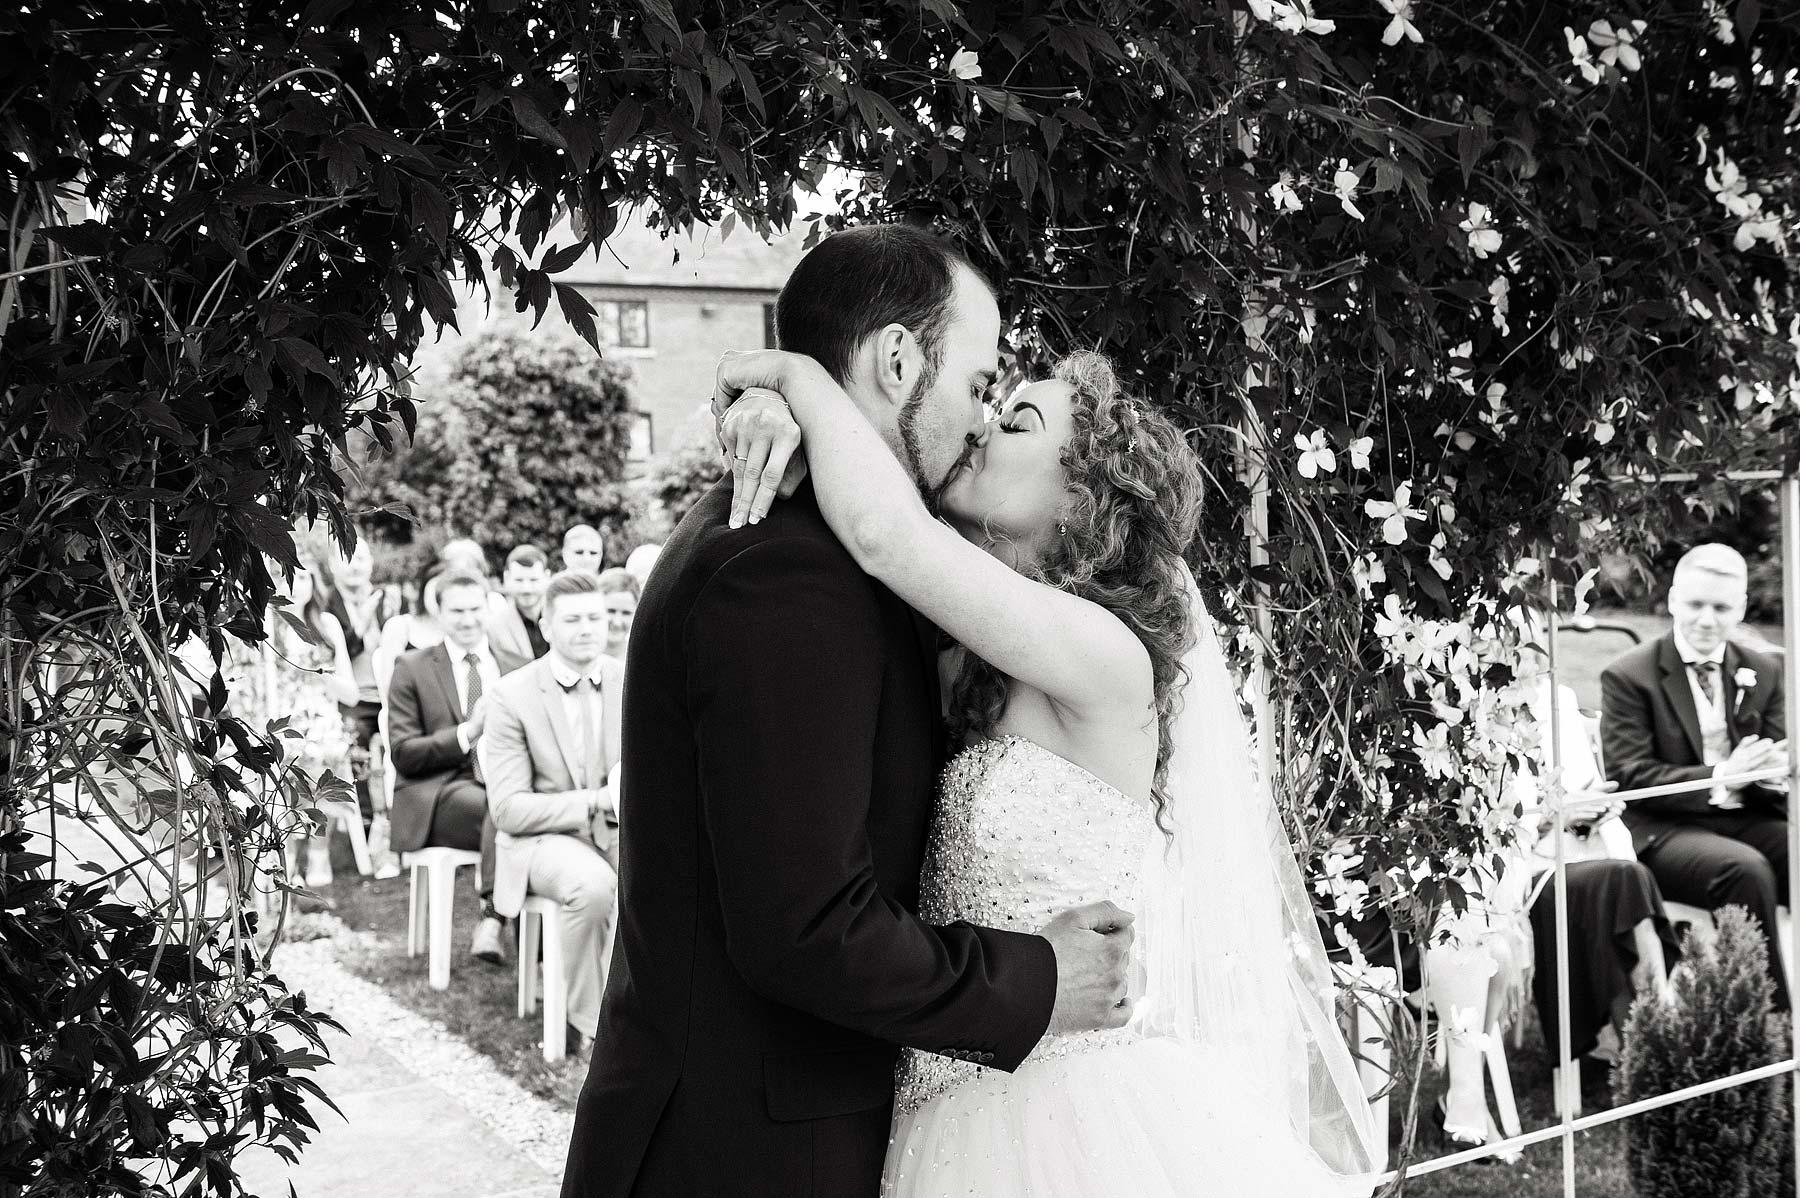 albright-hussey-manor-wedding-photographers-032